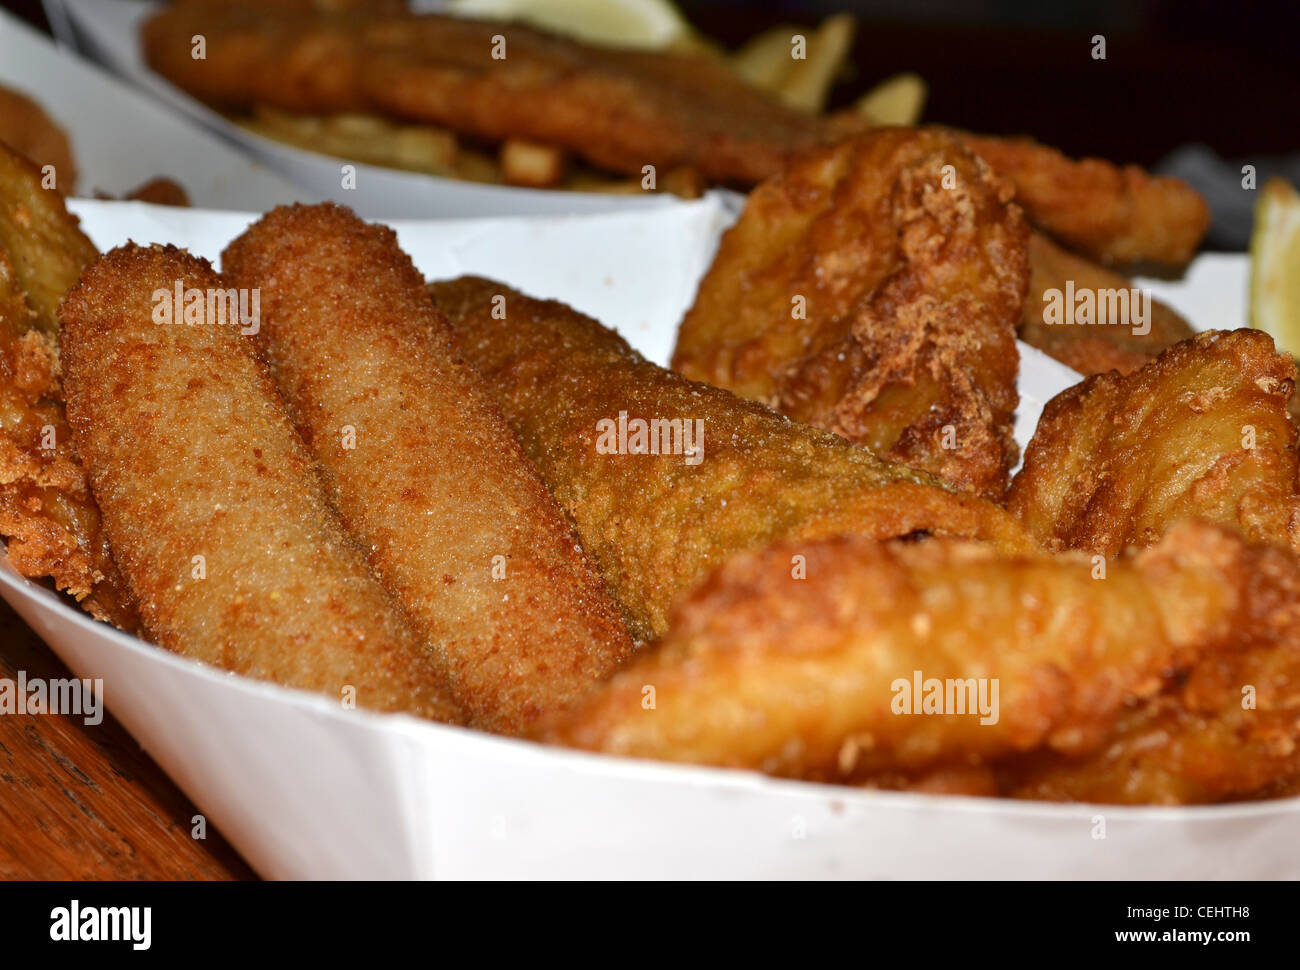 fish and chips, calamari, Chiko Roll, potato scallop, lemon fried seafood - Stock Image